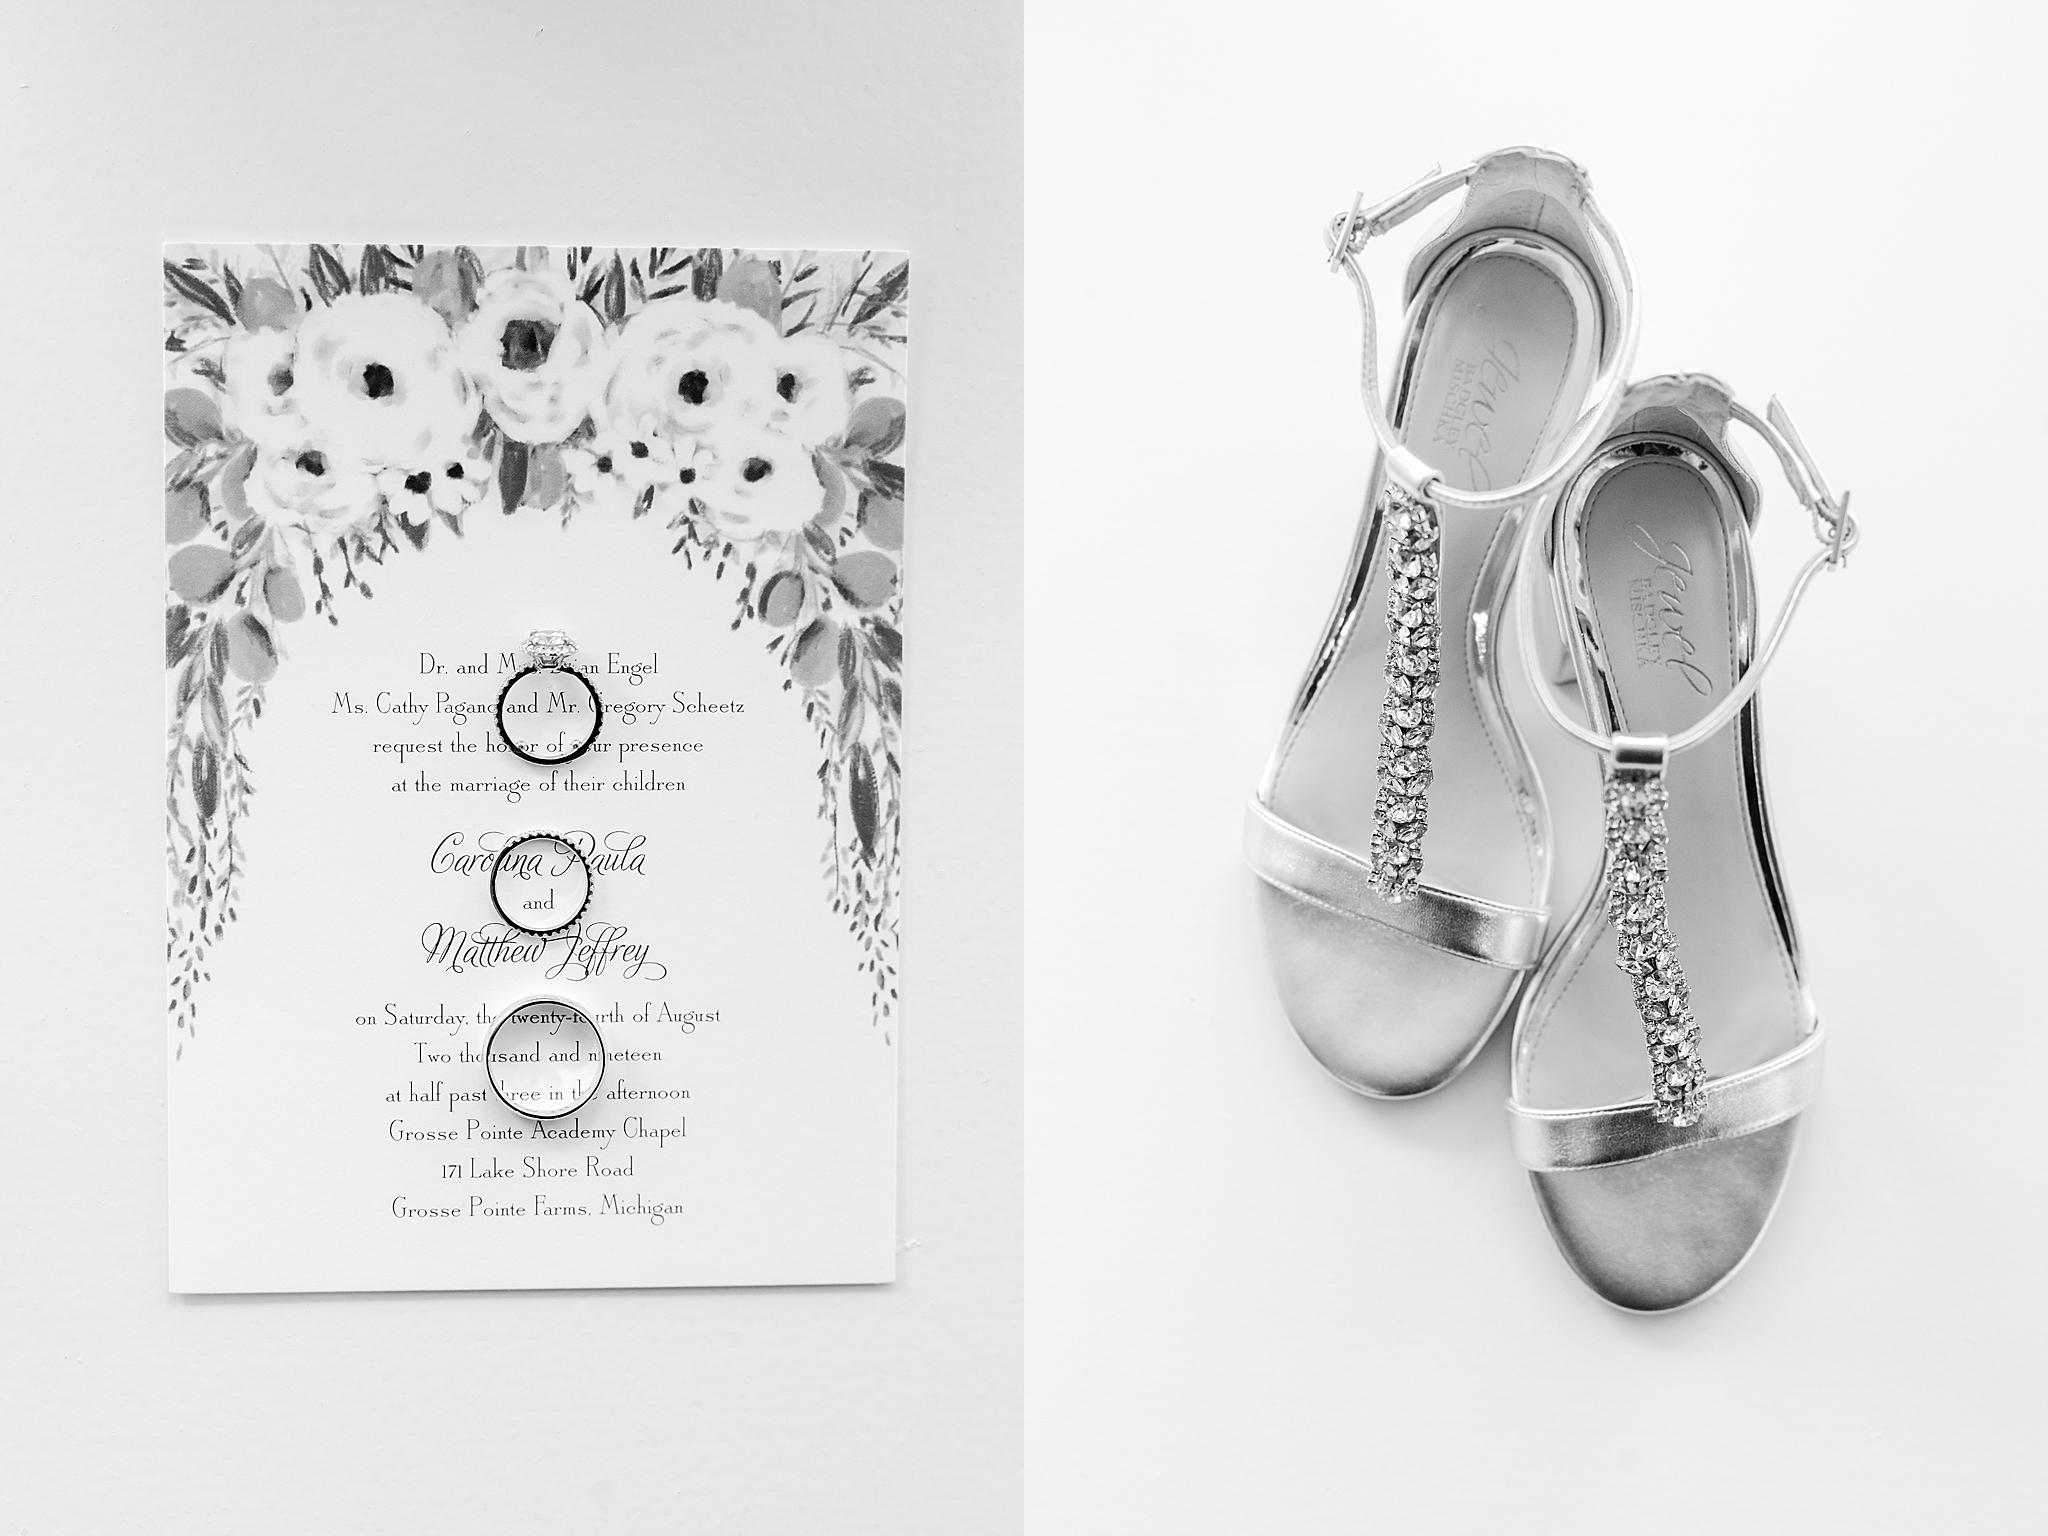 detroit-wedding-photographer-grosse-pointe-academy-chapel-detroit-golf-club-wedding-carly-matt-by-courtney-carolyn-photography_0001.jpg